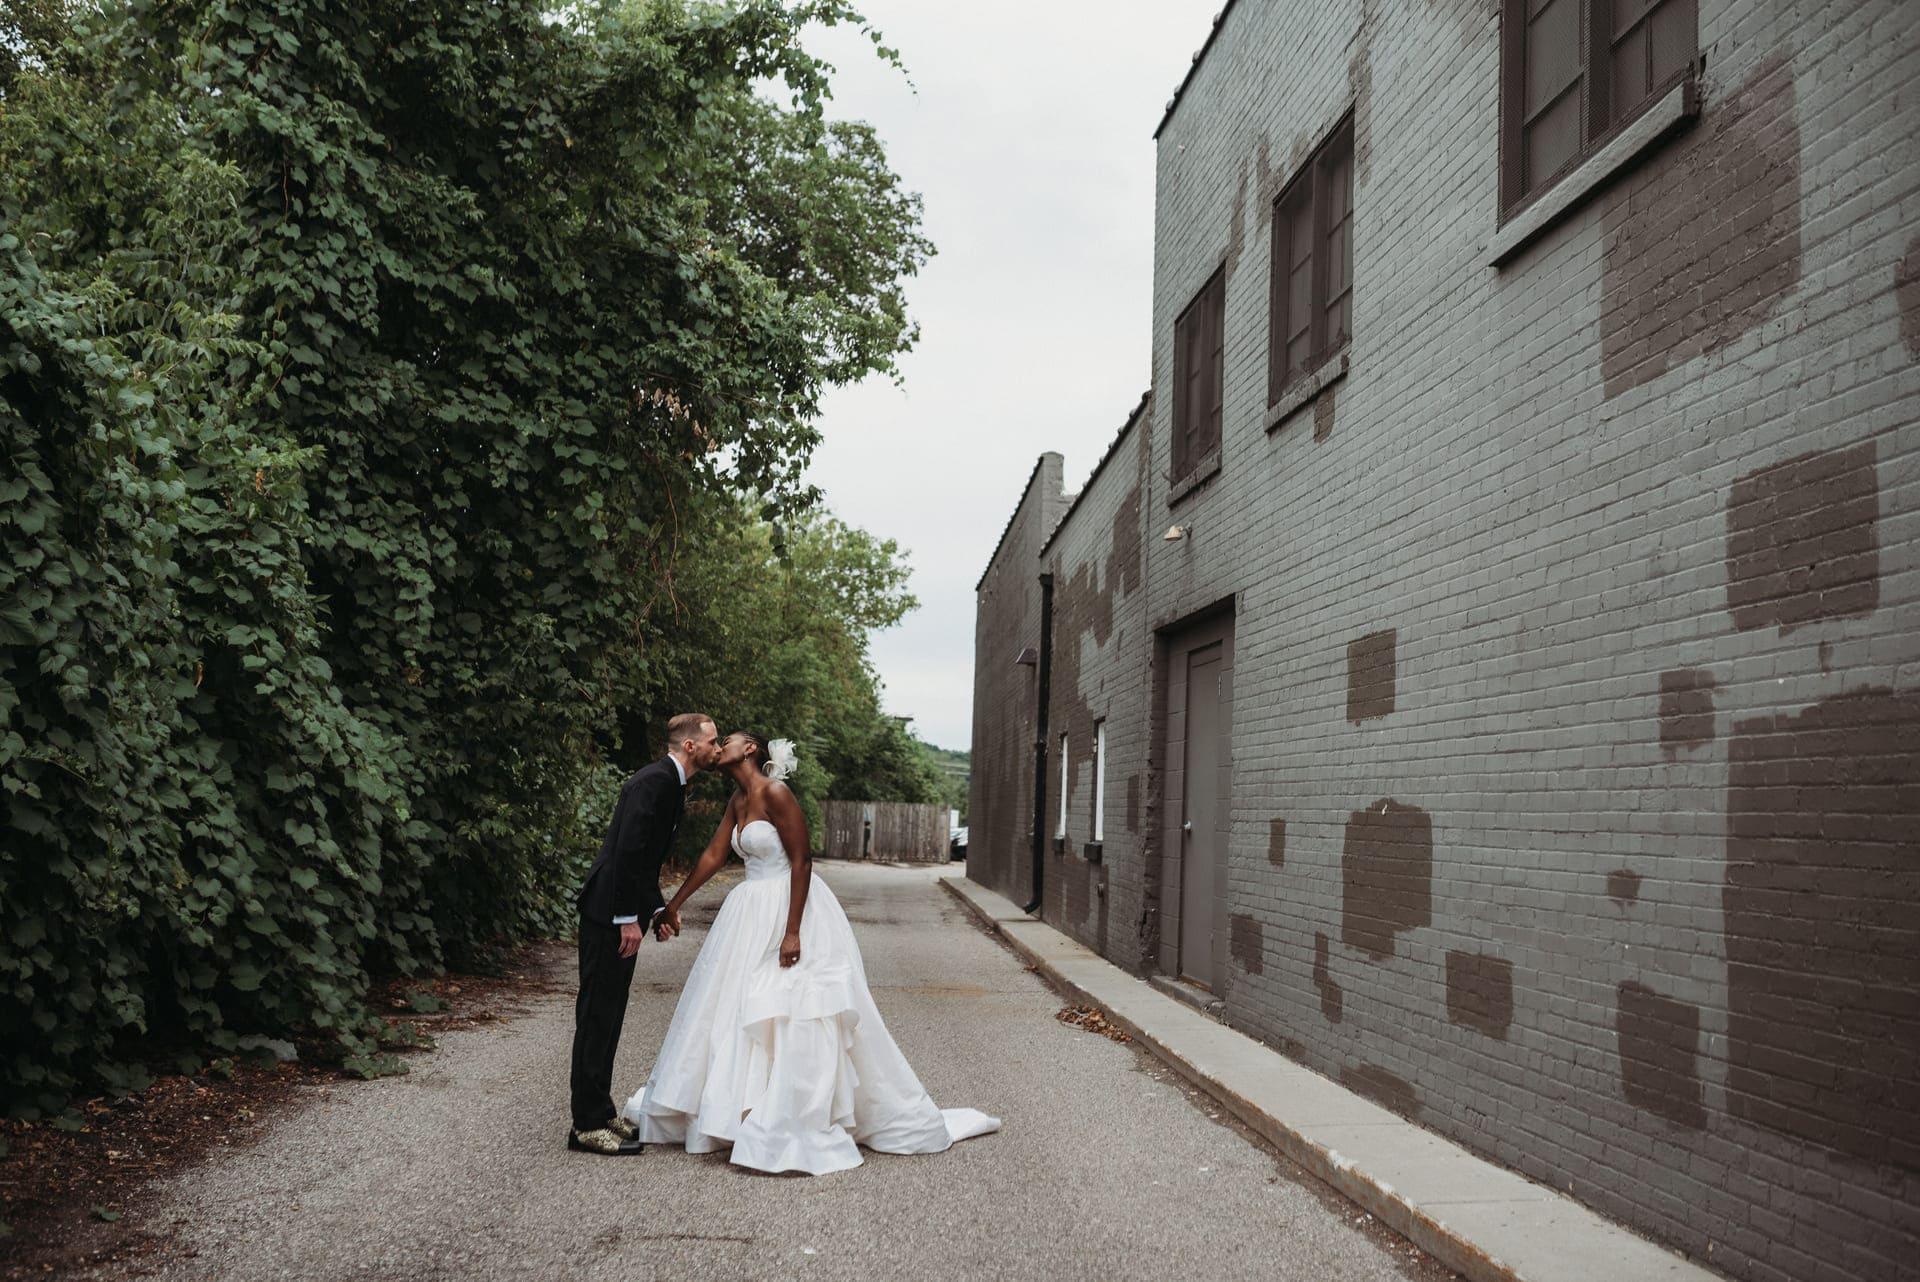 Men Woman Brides Richland Michigan Wedding Photography